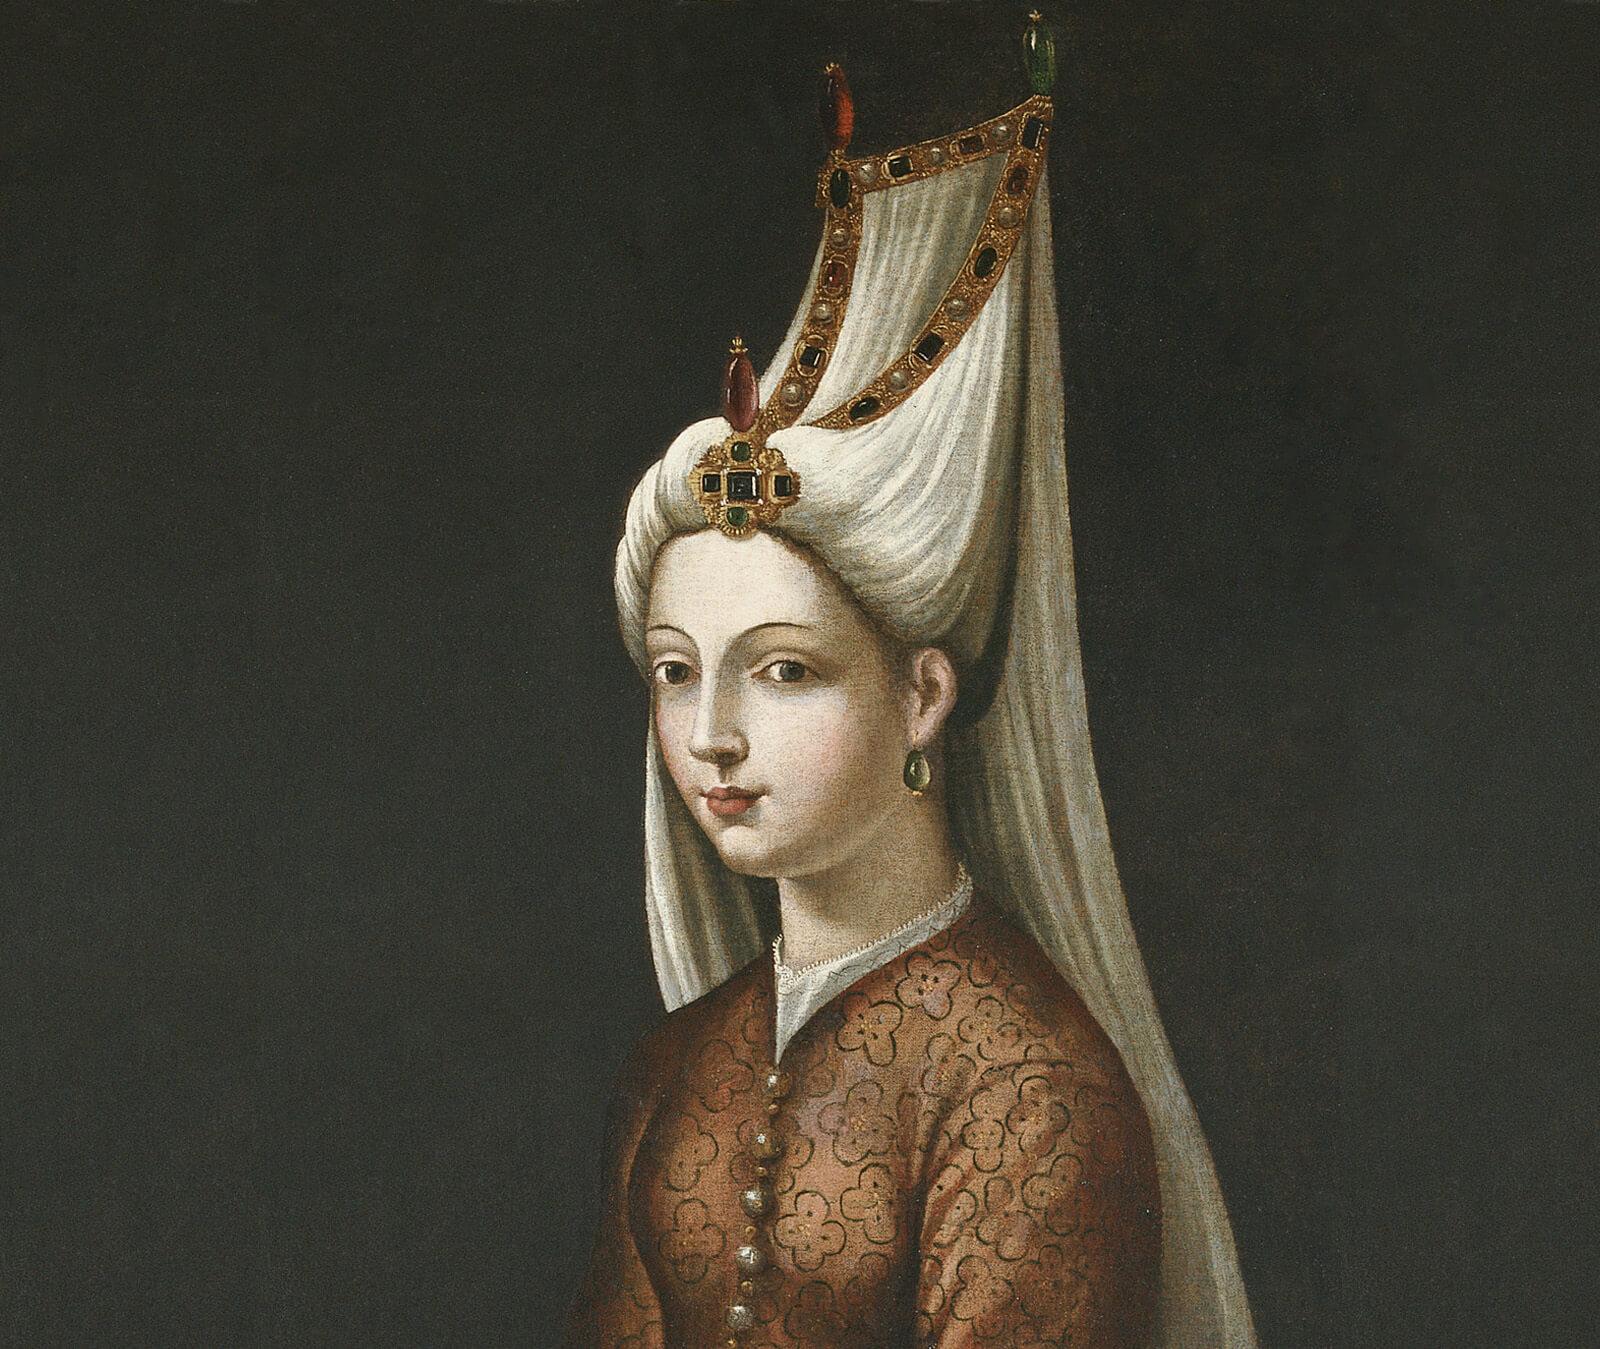 Михримах Султан - дочь османского султана Сулеймана I